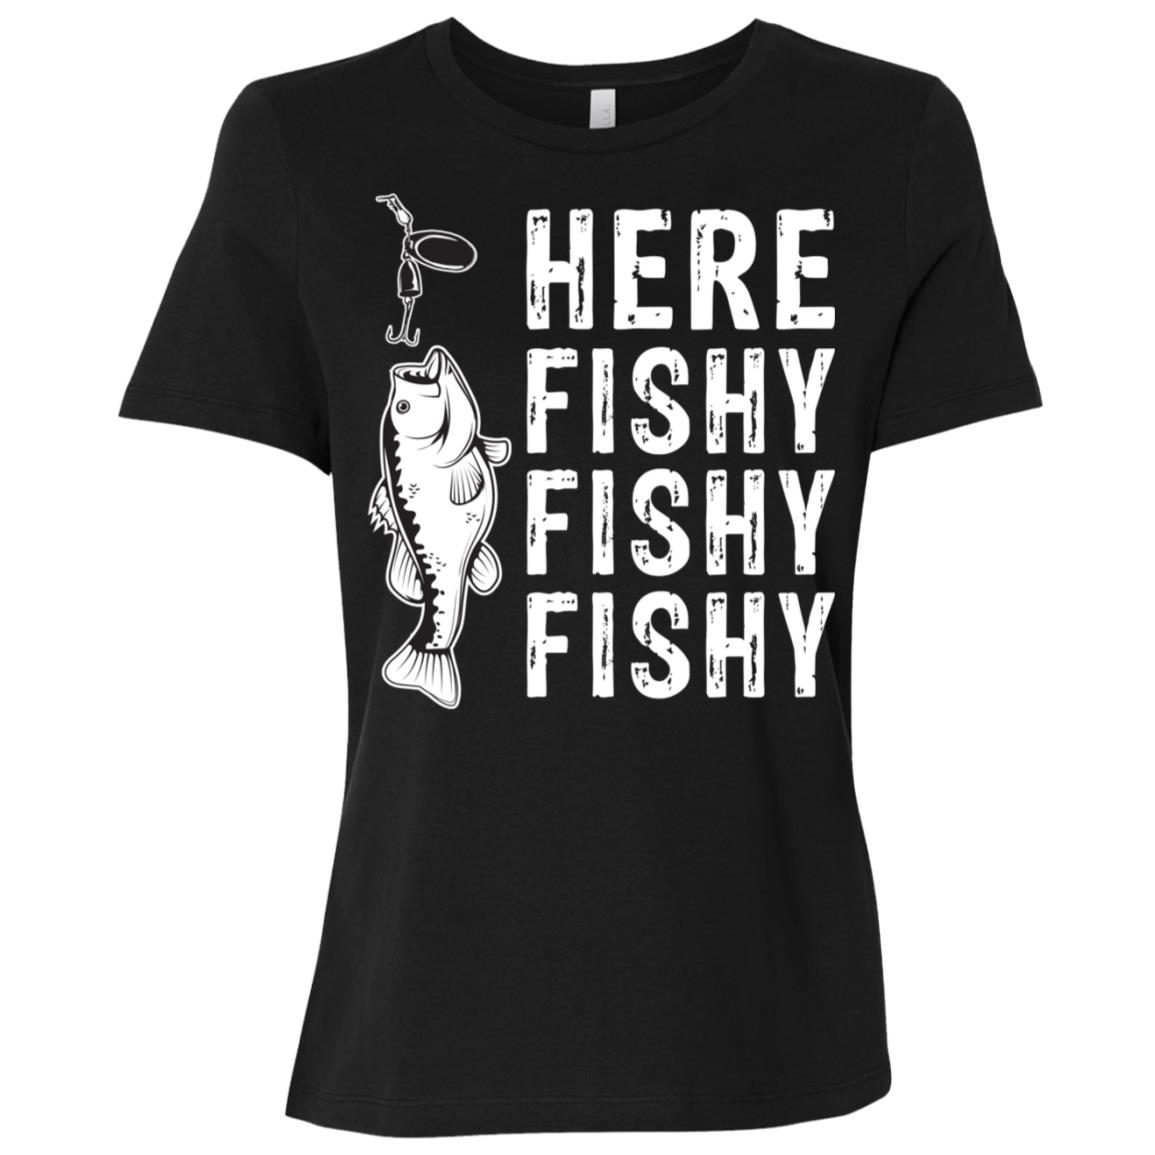 Here Fishy Fishy Fishy Tee Funny Outdoor Hunting Women Short Sleeve T-Shirt